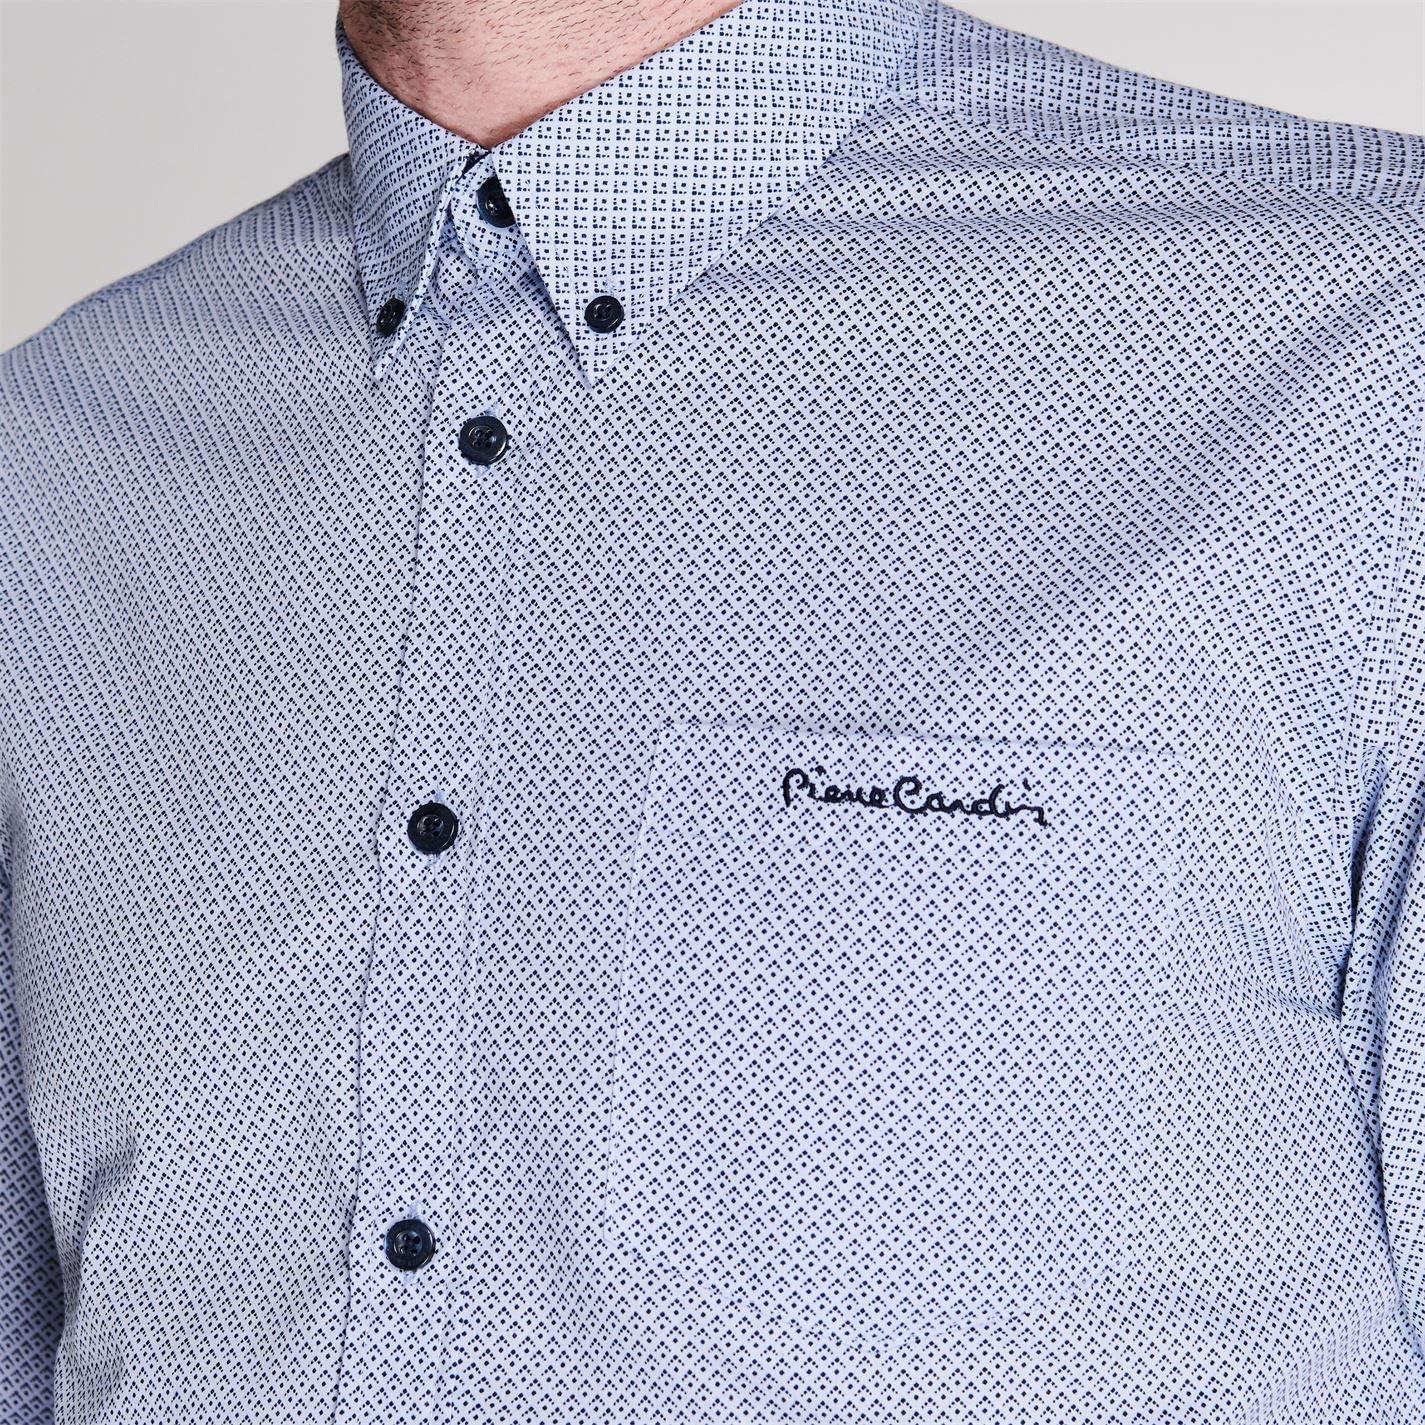 Pierre Cardin. Camisa de manga larga casual para hombre: Amazon.es ...